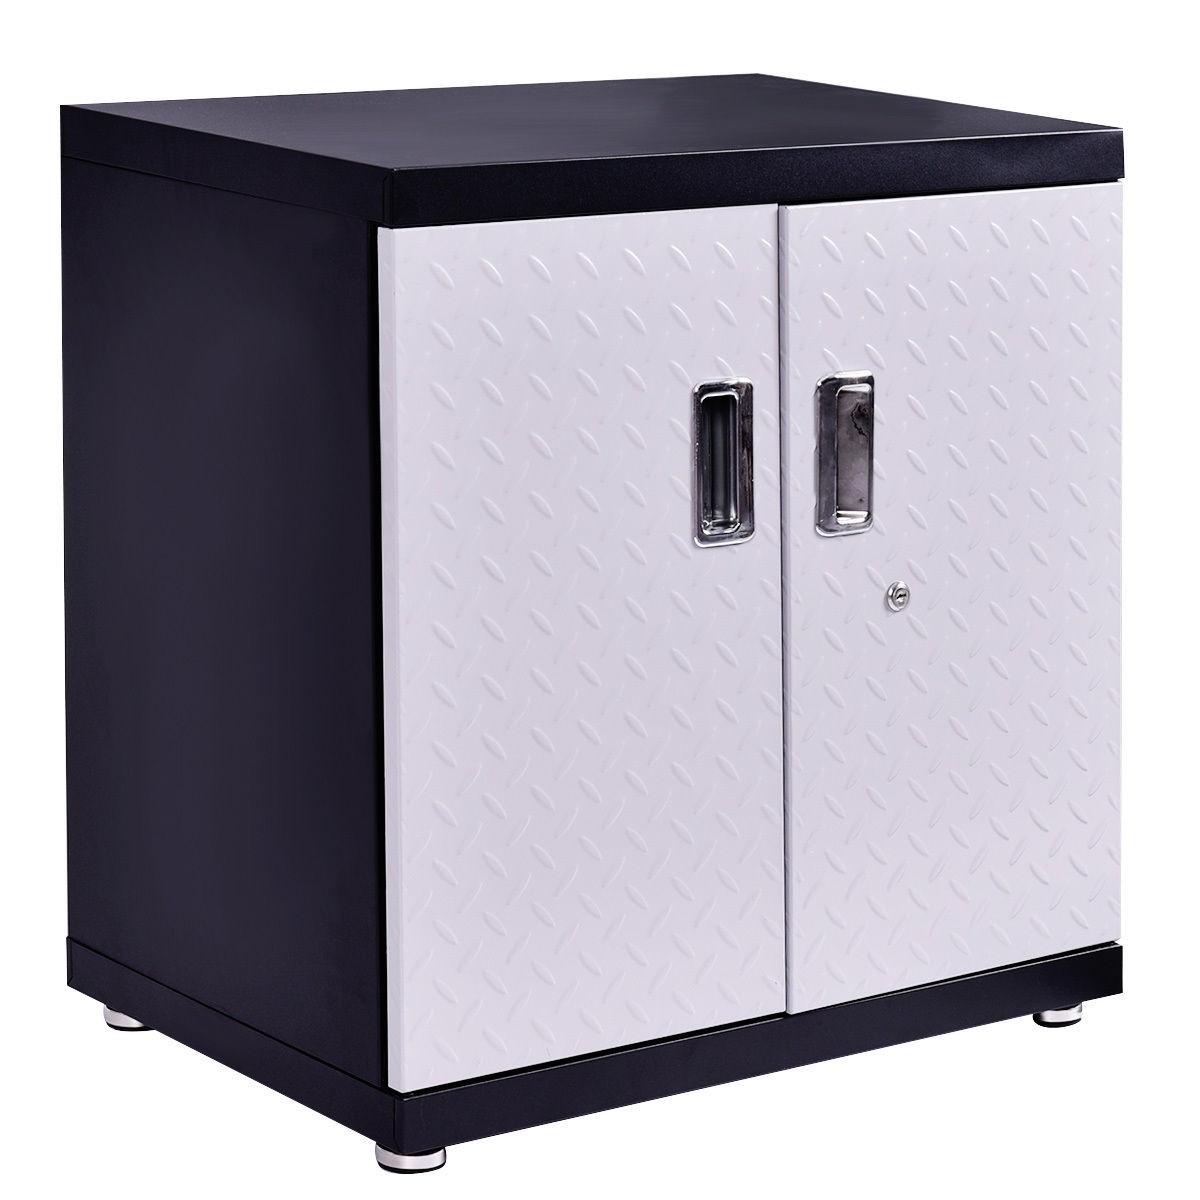 wall mount cabinet metal garage steel storage box organizer 2 shelves tool ebay. Black Bedroom Furniture Sets. Home Design Ideas